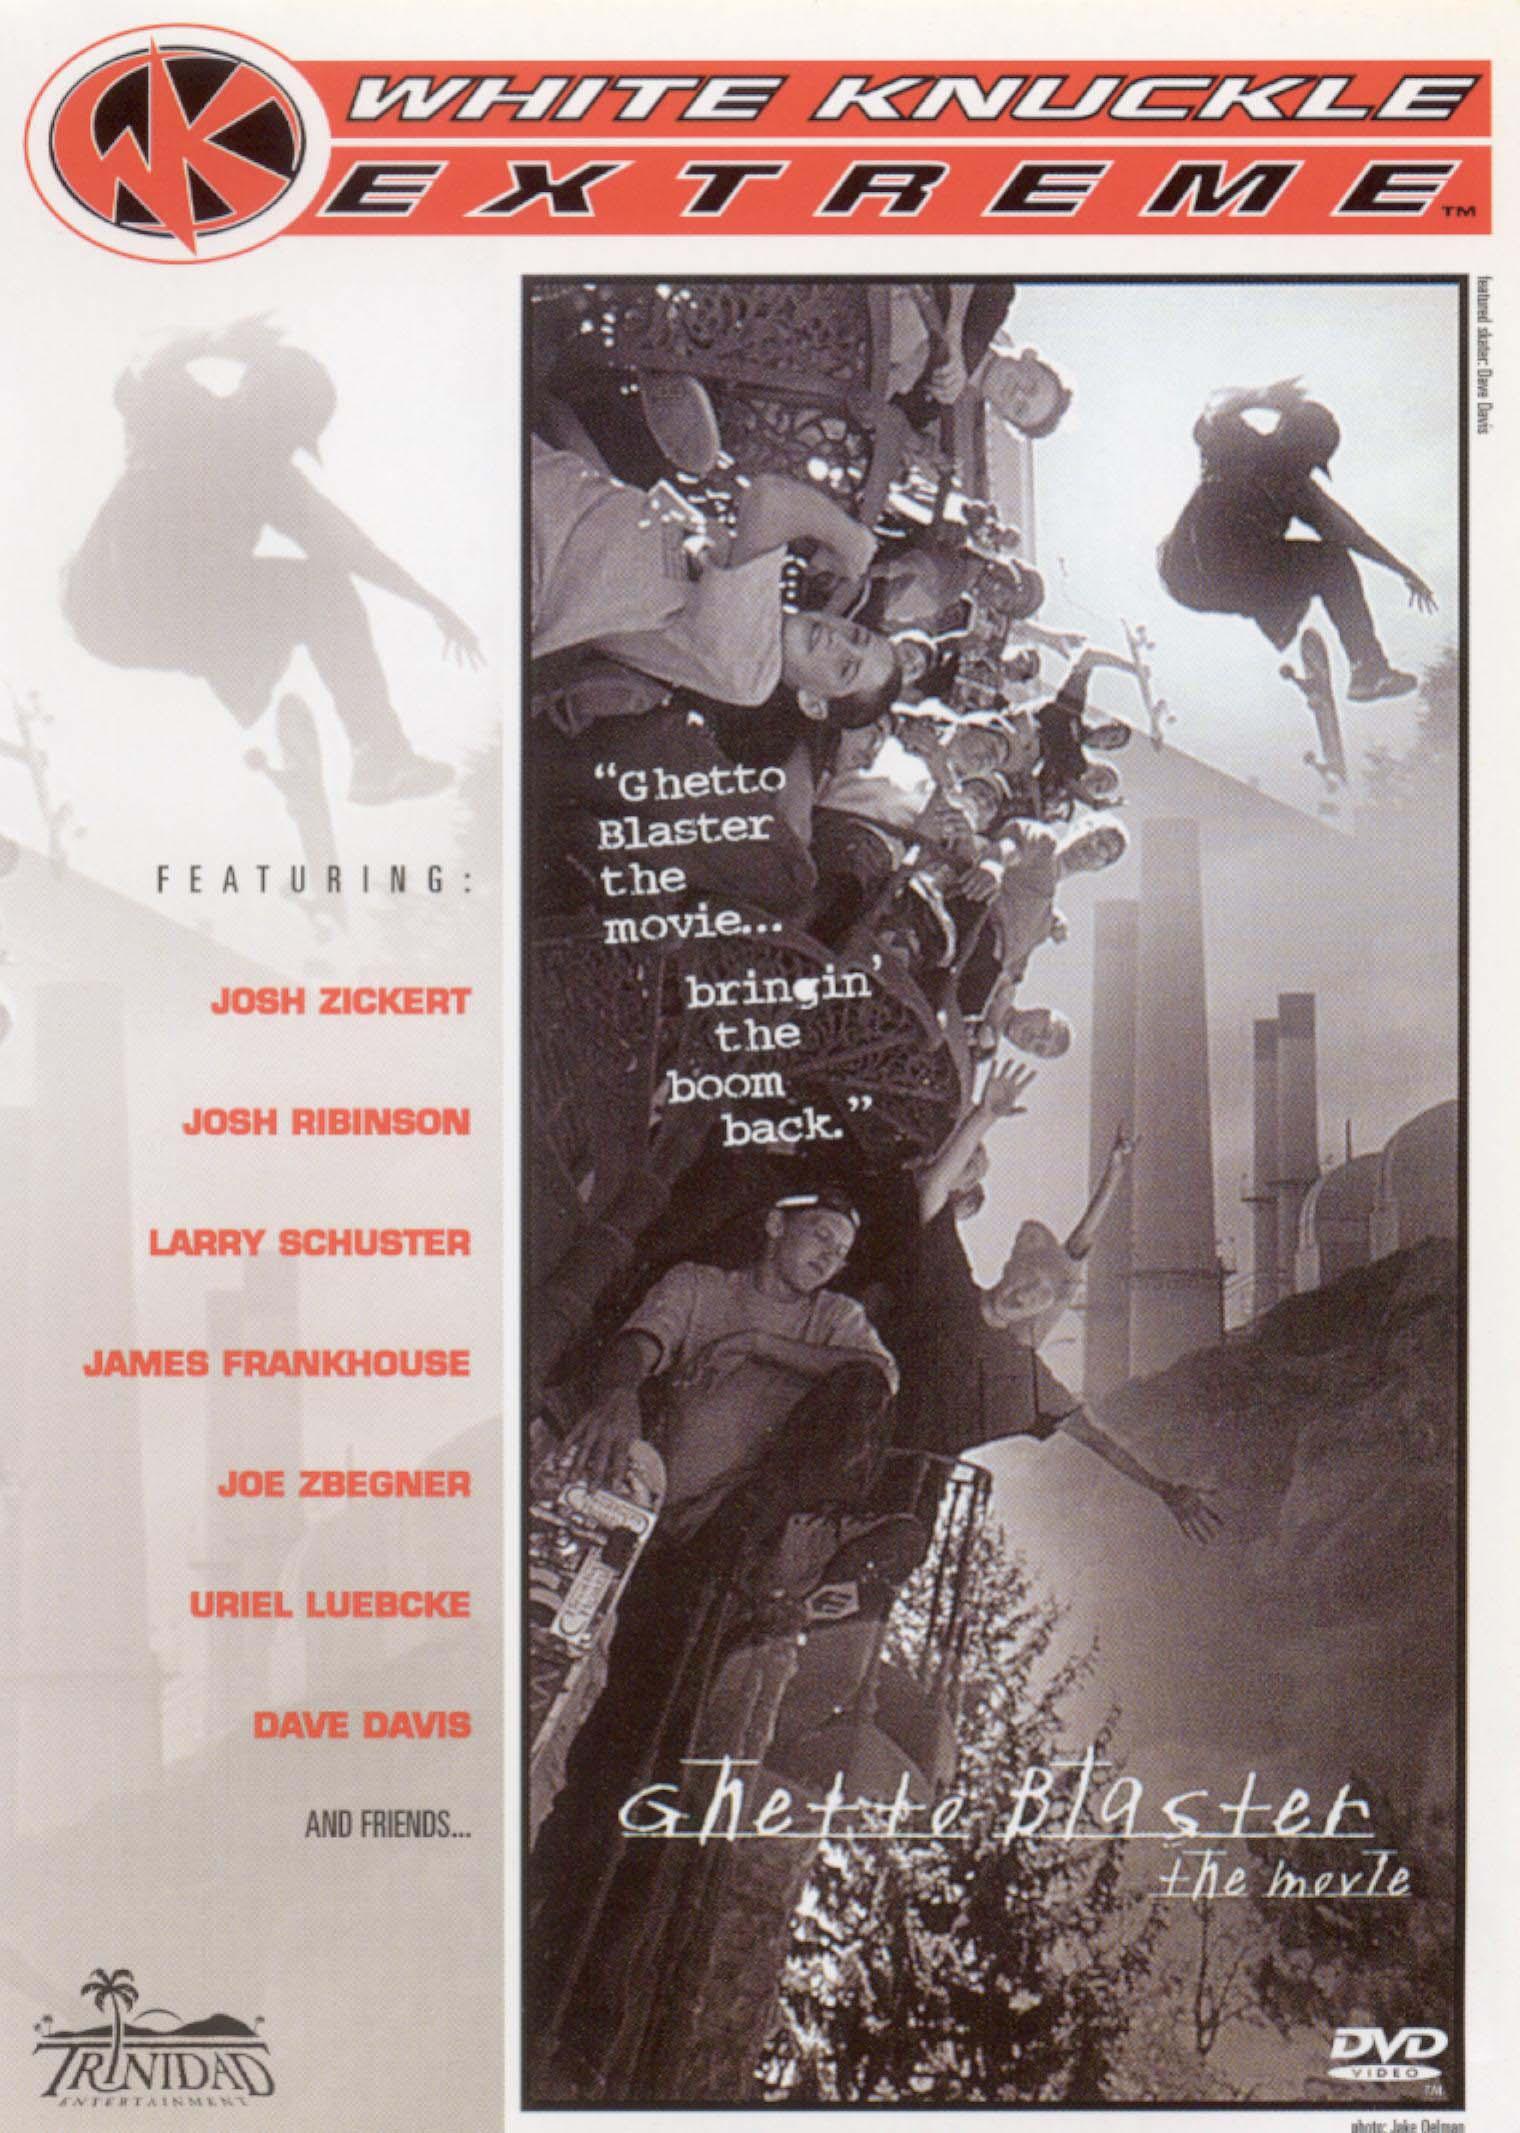 White Knuckle Extreme: Ghetto Blaster - The Movie